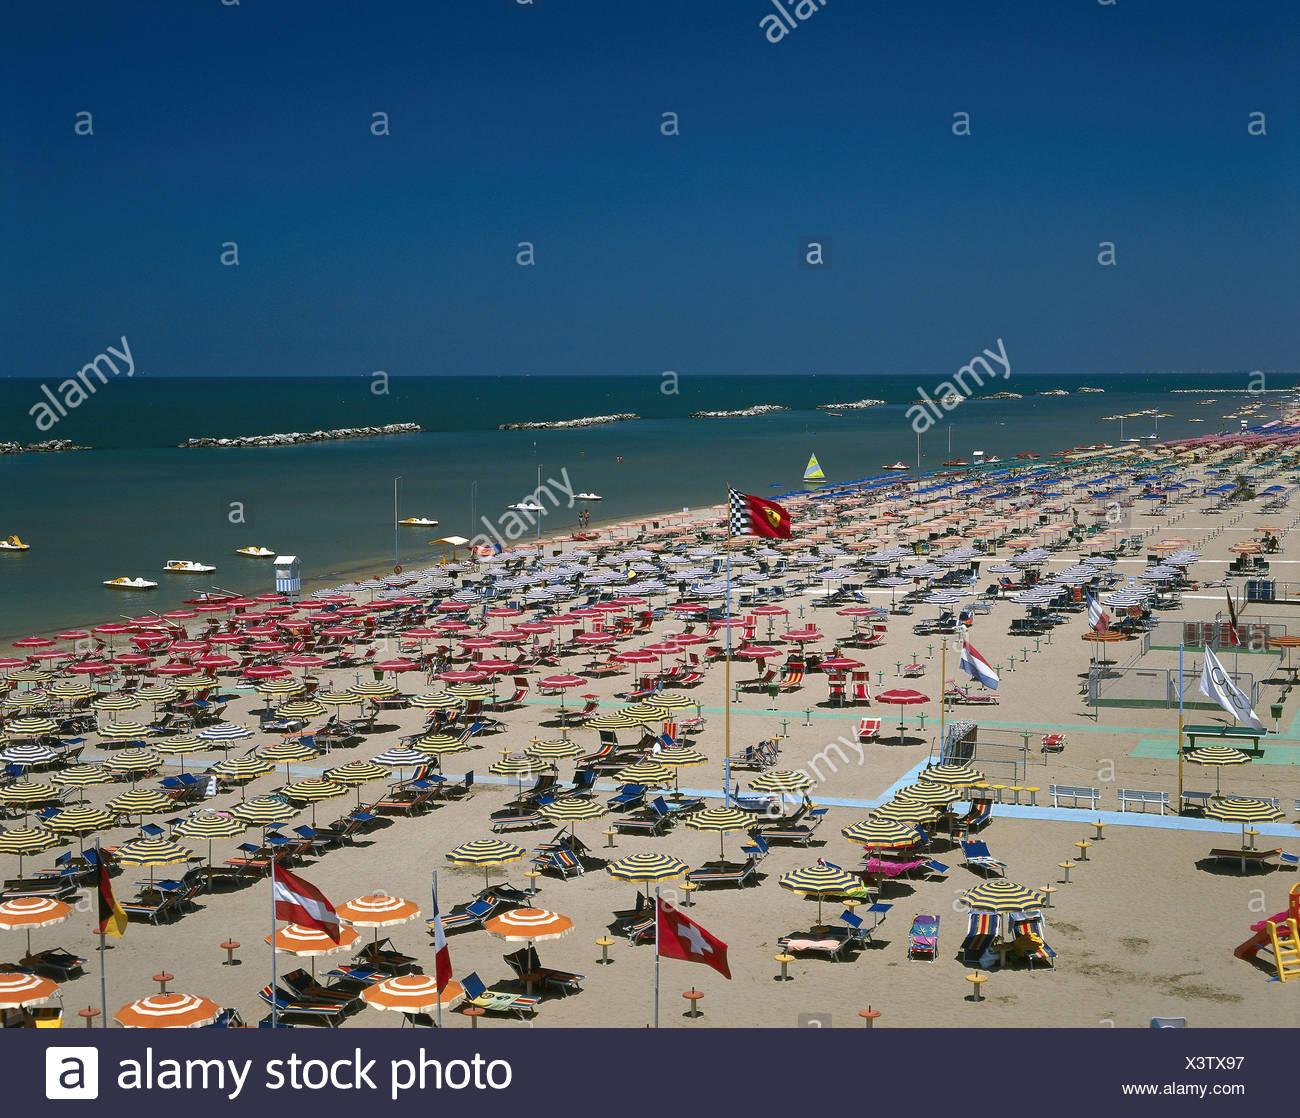 L 39 italia emilia romagna bellaria igea marina spiaggia adriatico mare italiano spiaggia - Bagno eden igea marina ...